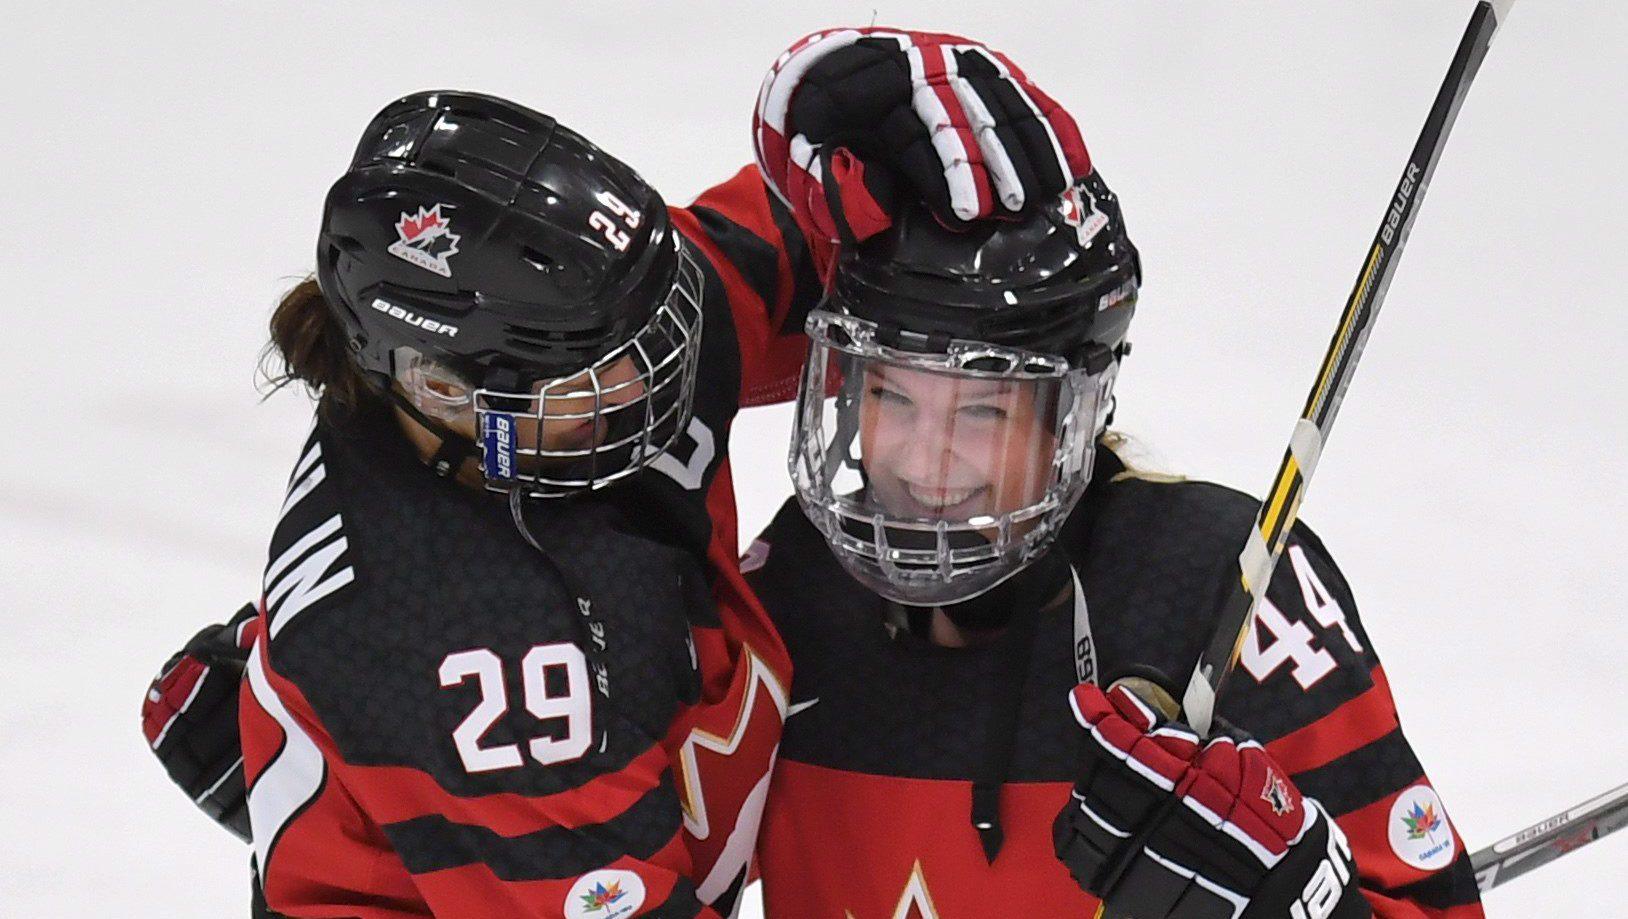 Team Canada S Short List For Women S Olympic Hockey Announced Team Canada Official Olympic Team Website